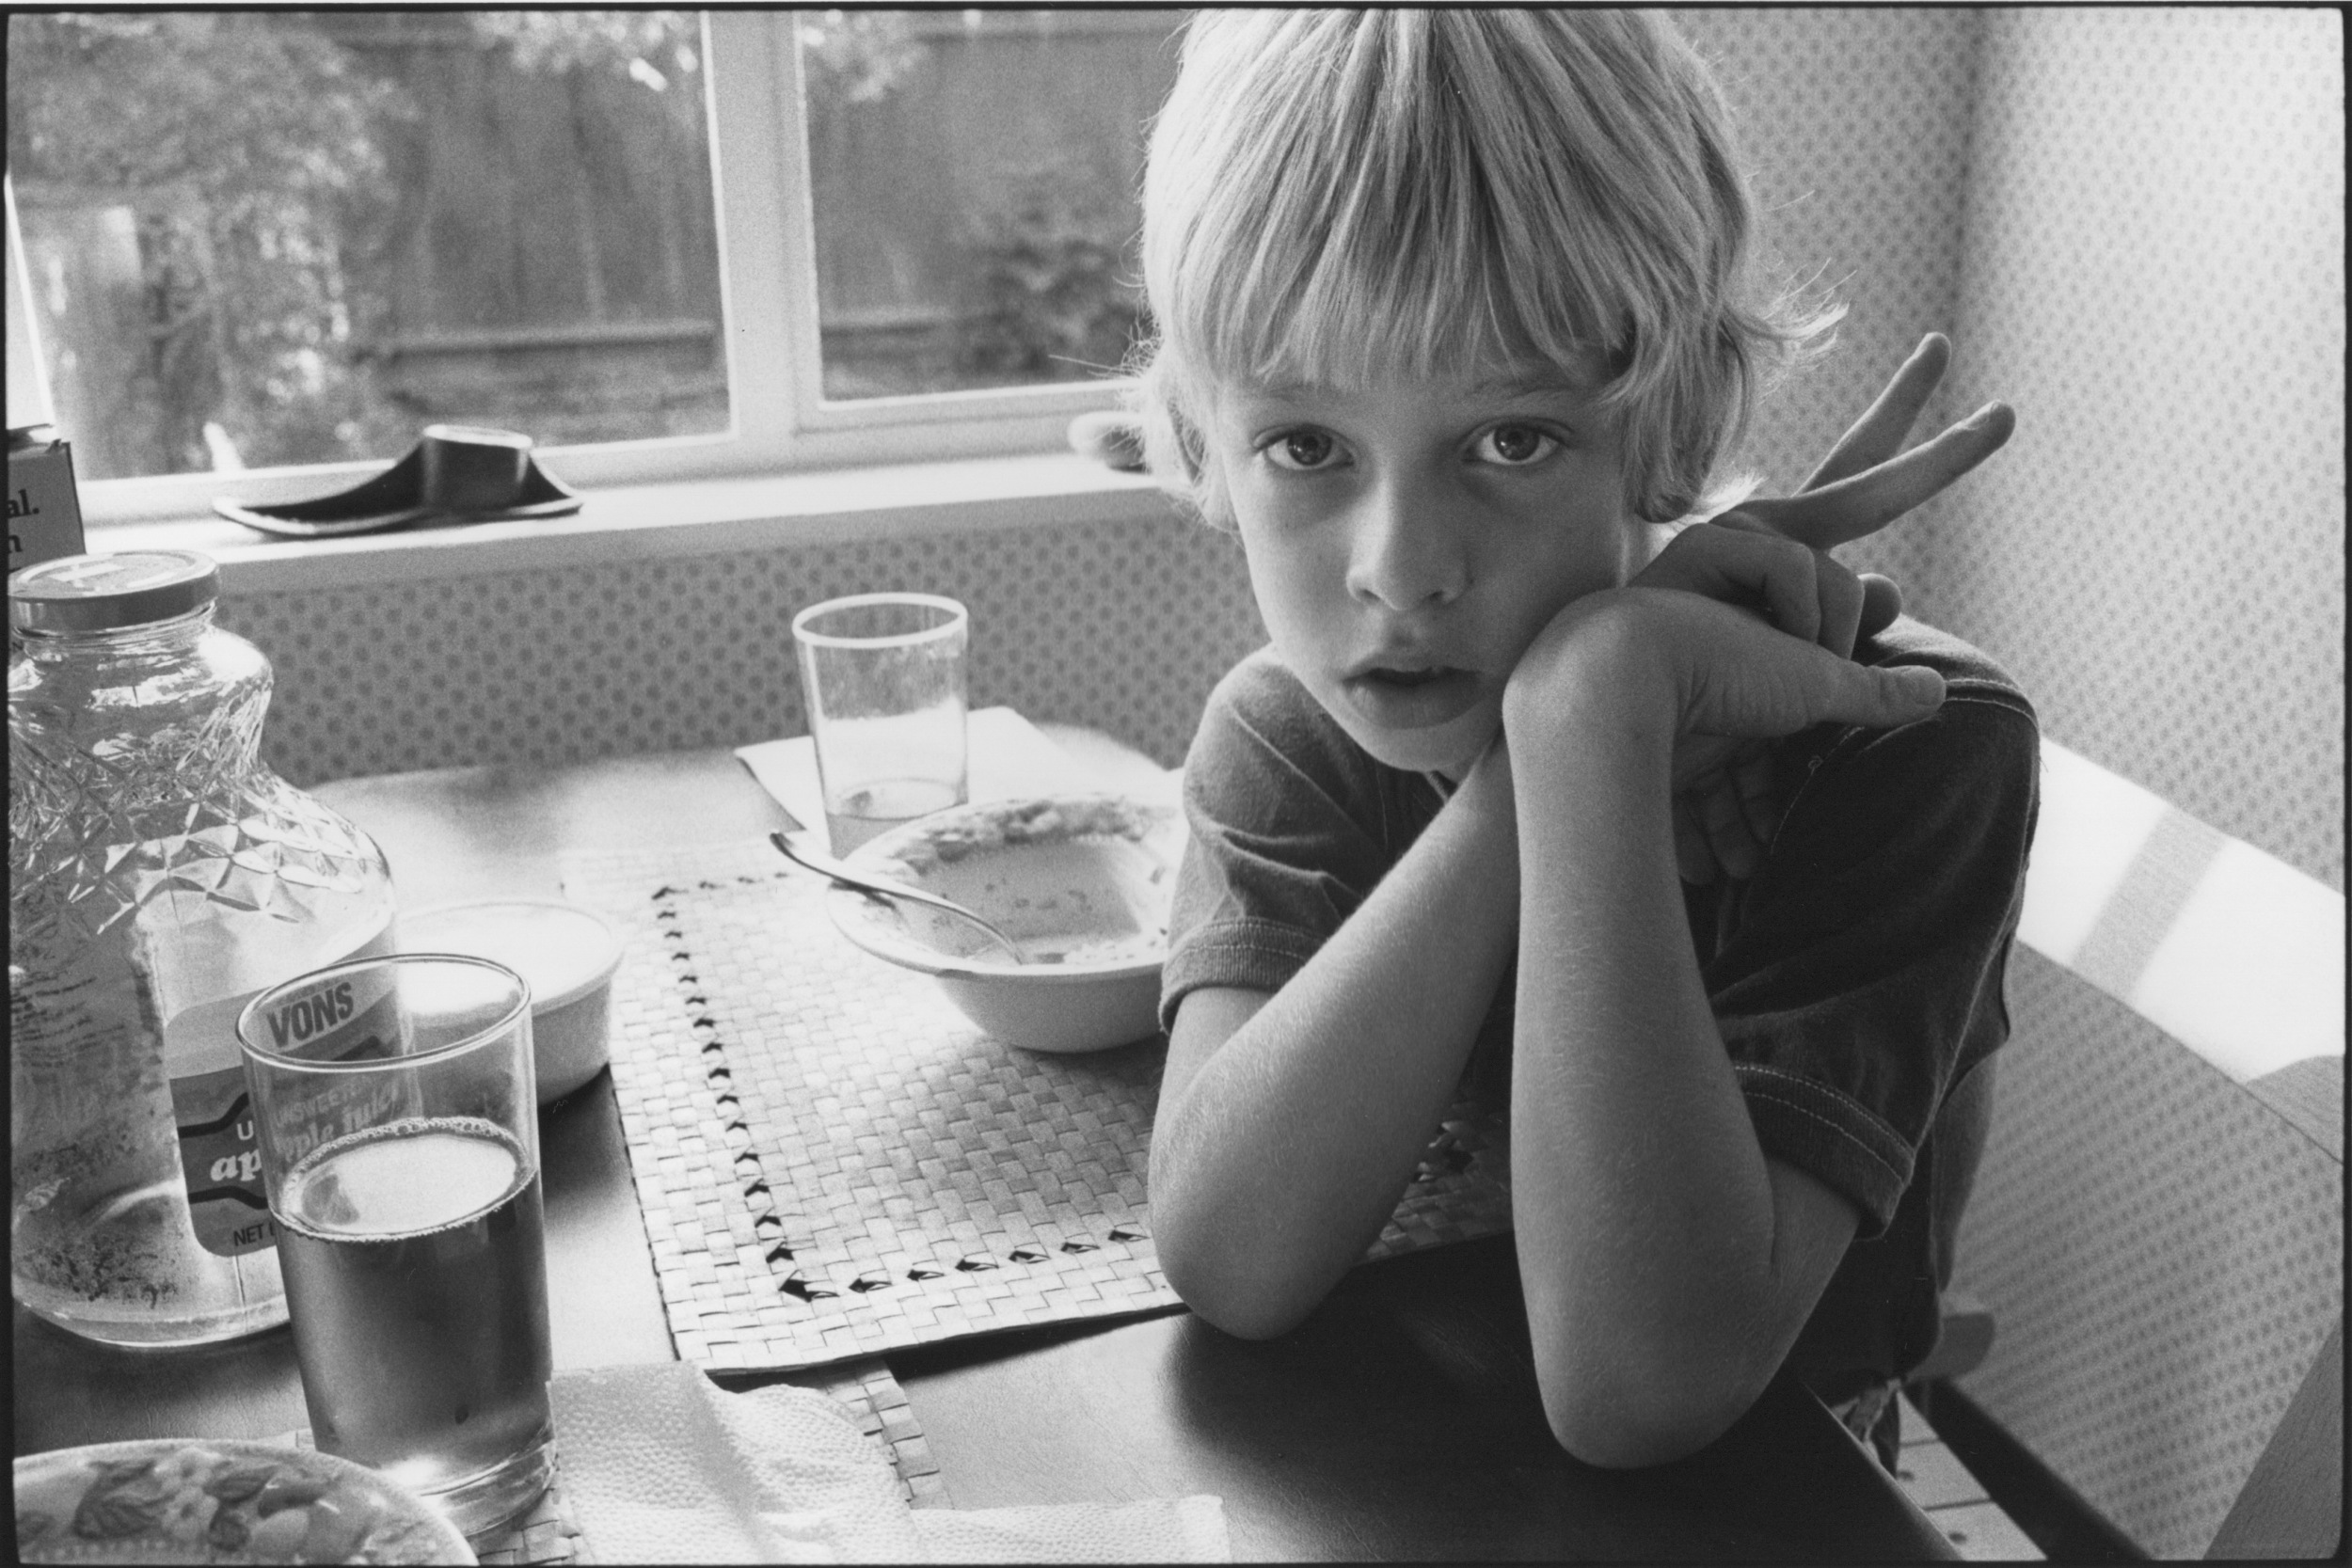 """Lindsay at Breakfast, 1980s"" by Harry Wilson"